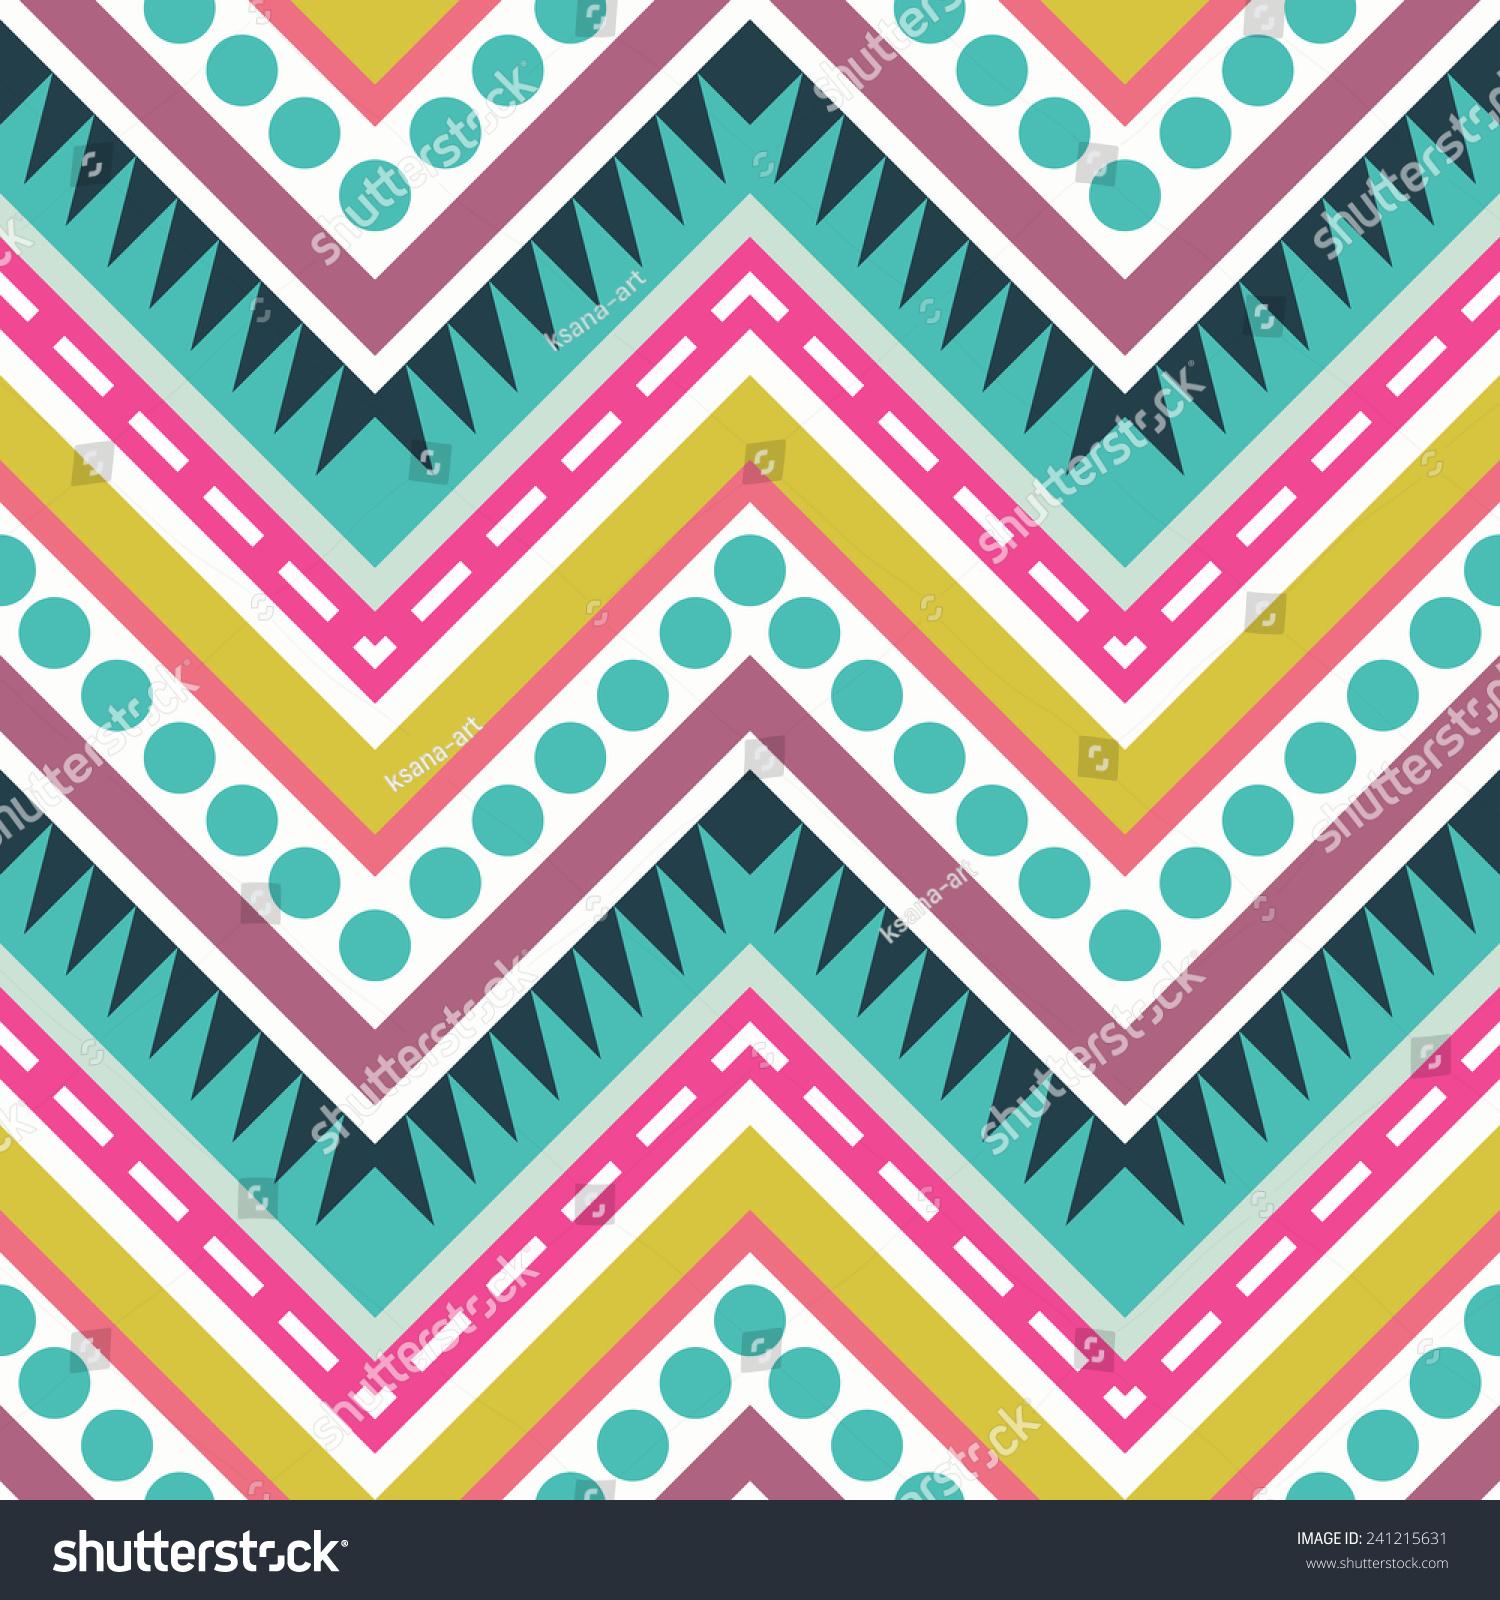 zig zag wallpaper bright color-#30